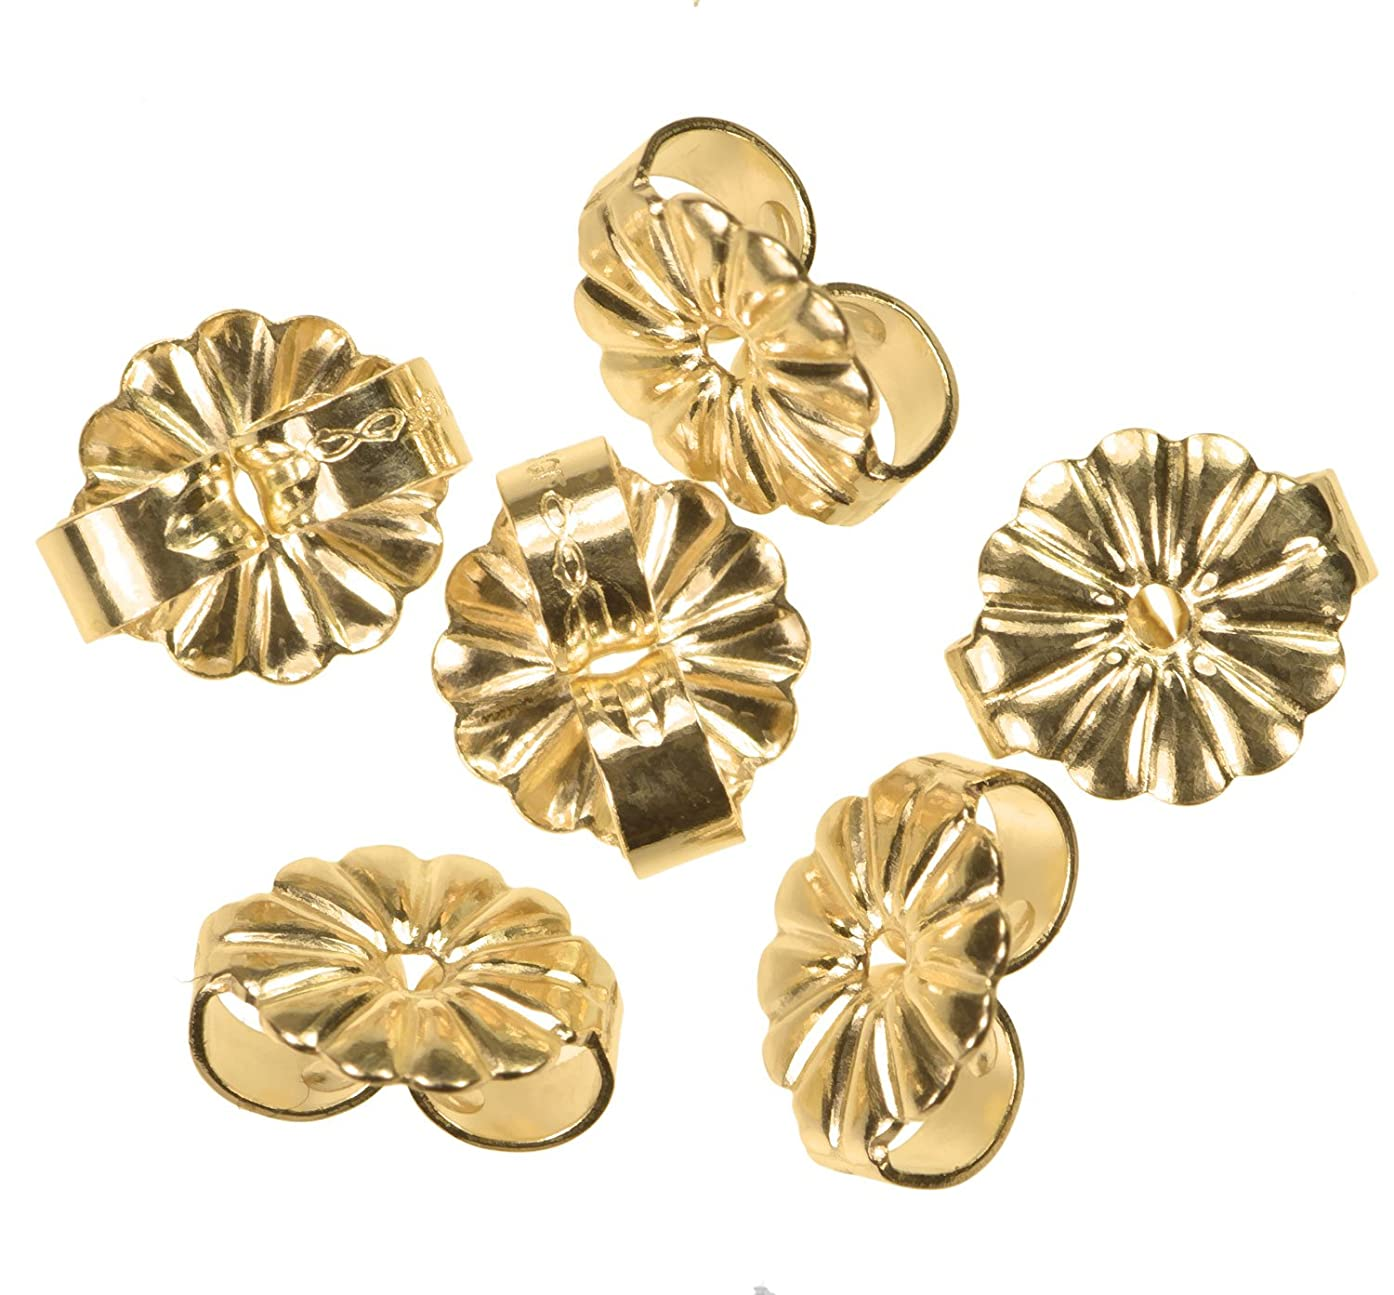 14K Gold Fill Medium Earring Back 6mm 3-Pairs